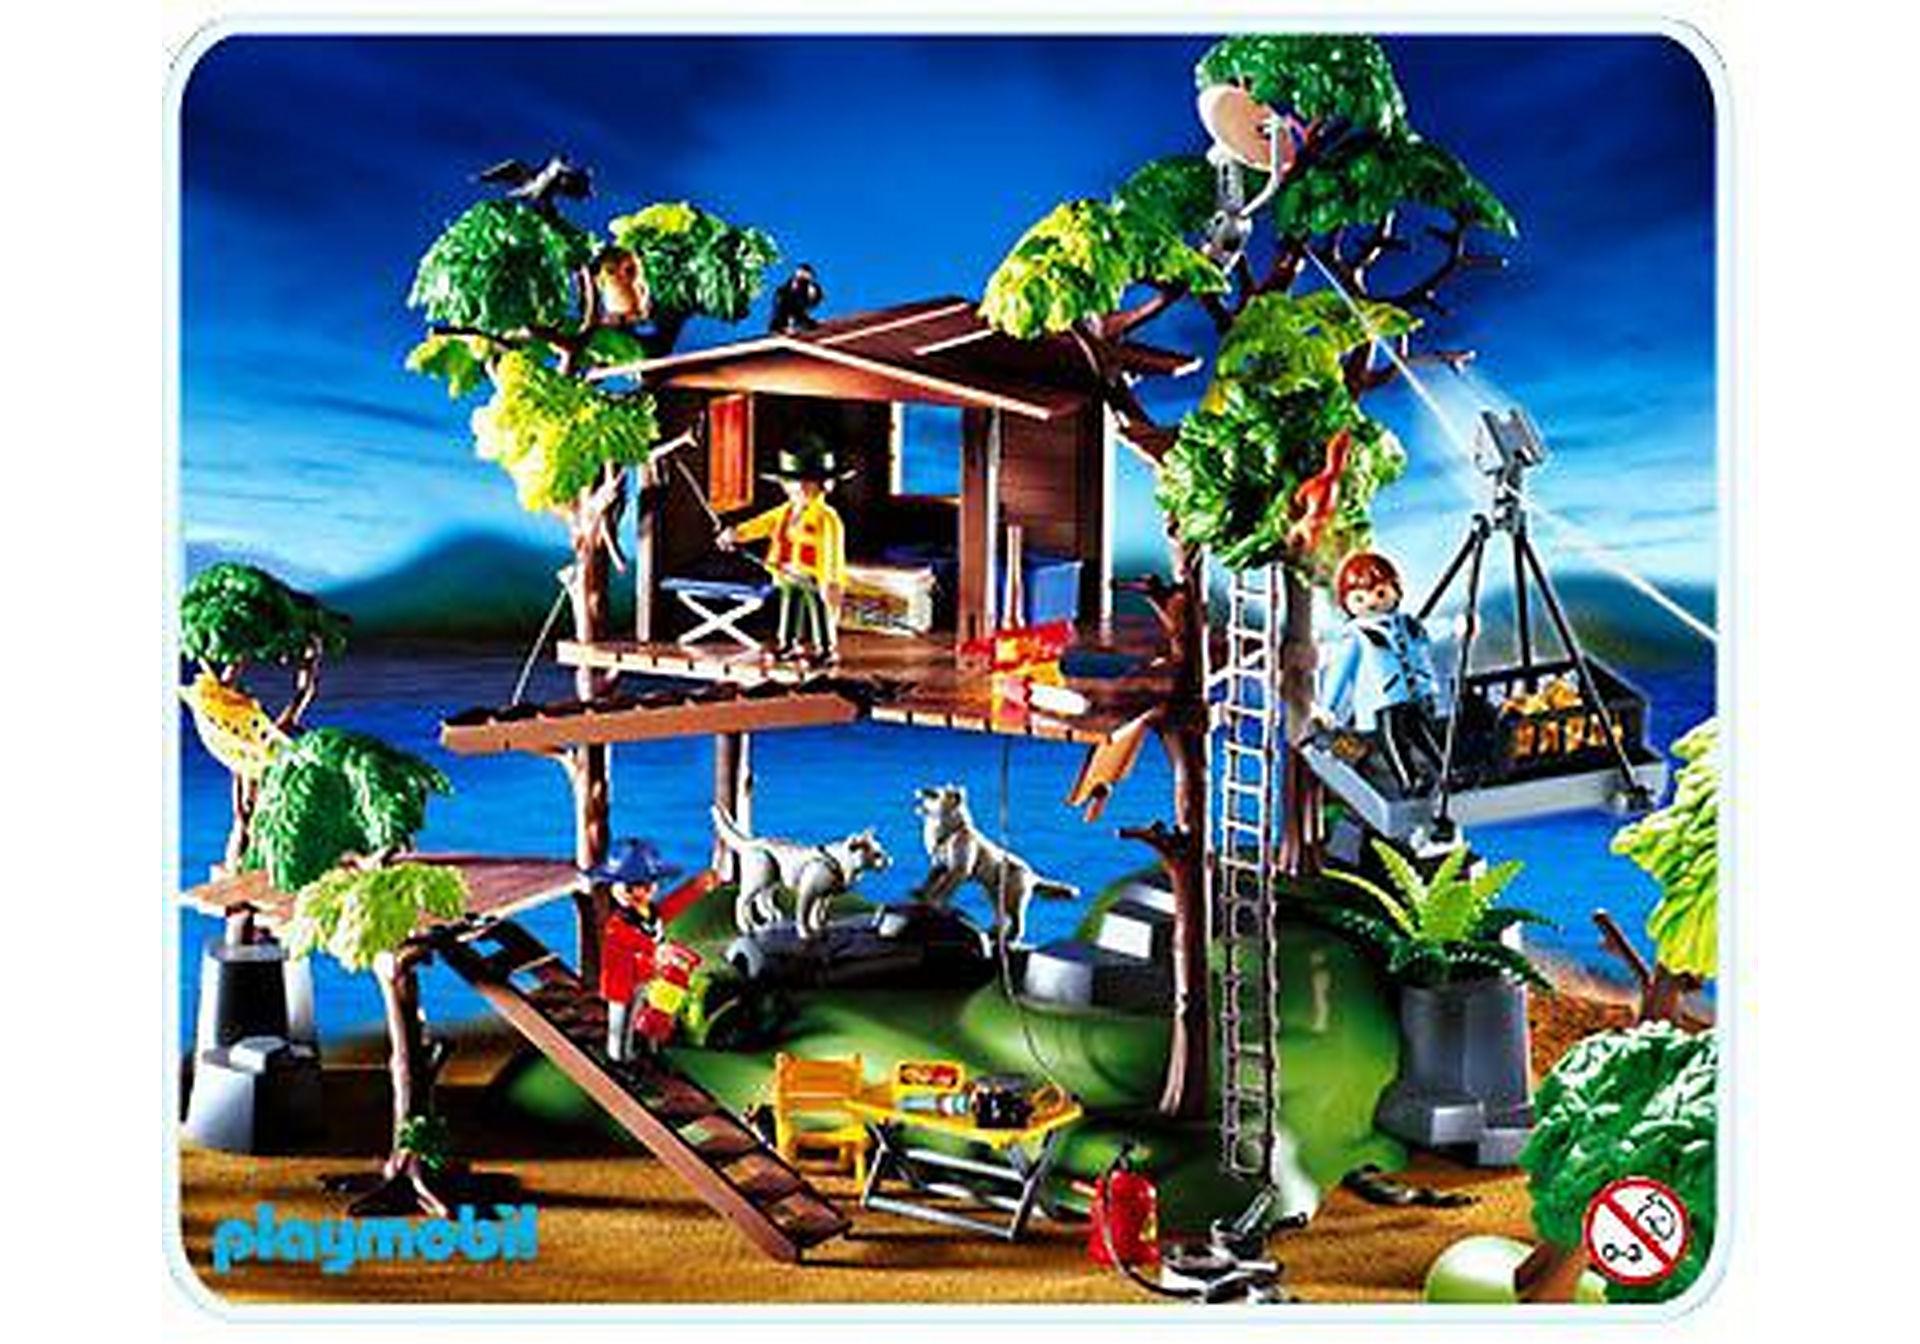 http://media.playmobil.com/i/playmobil/3217-B_product_detail/Baumhaus